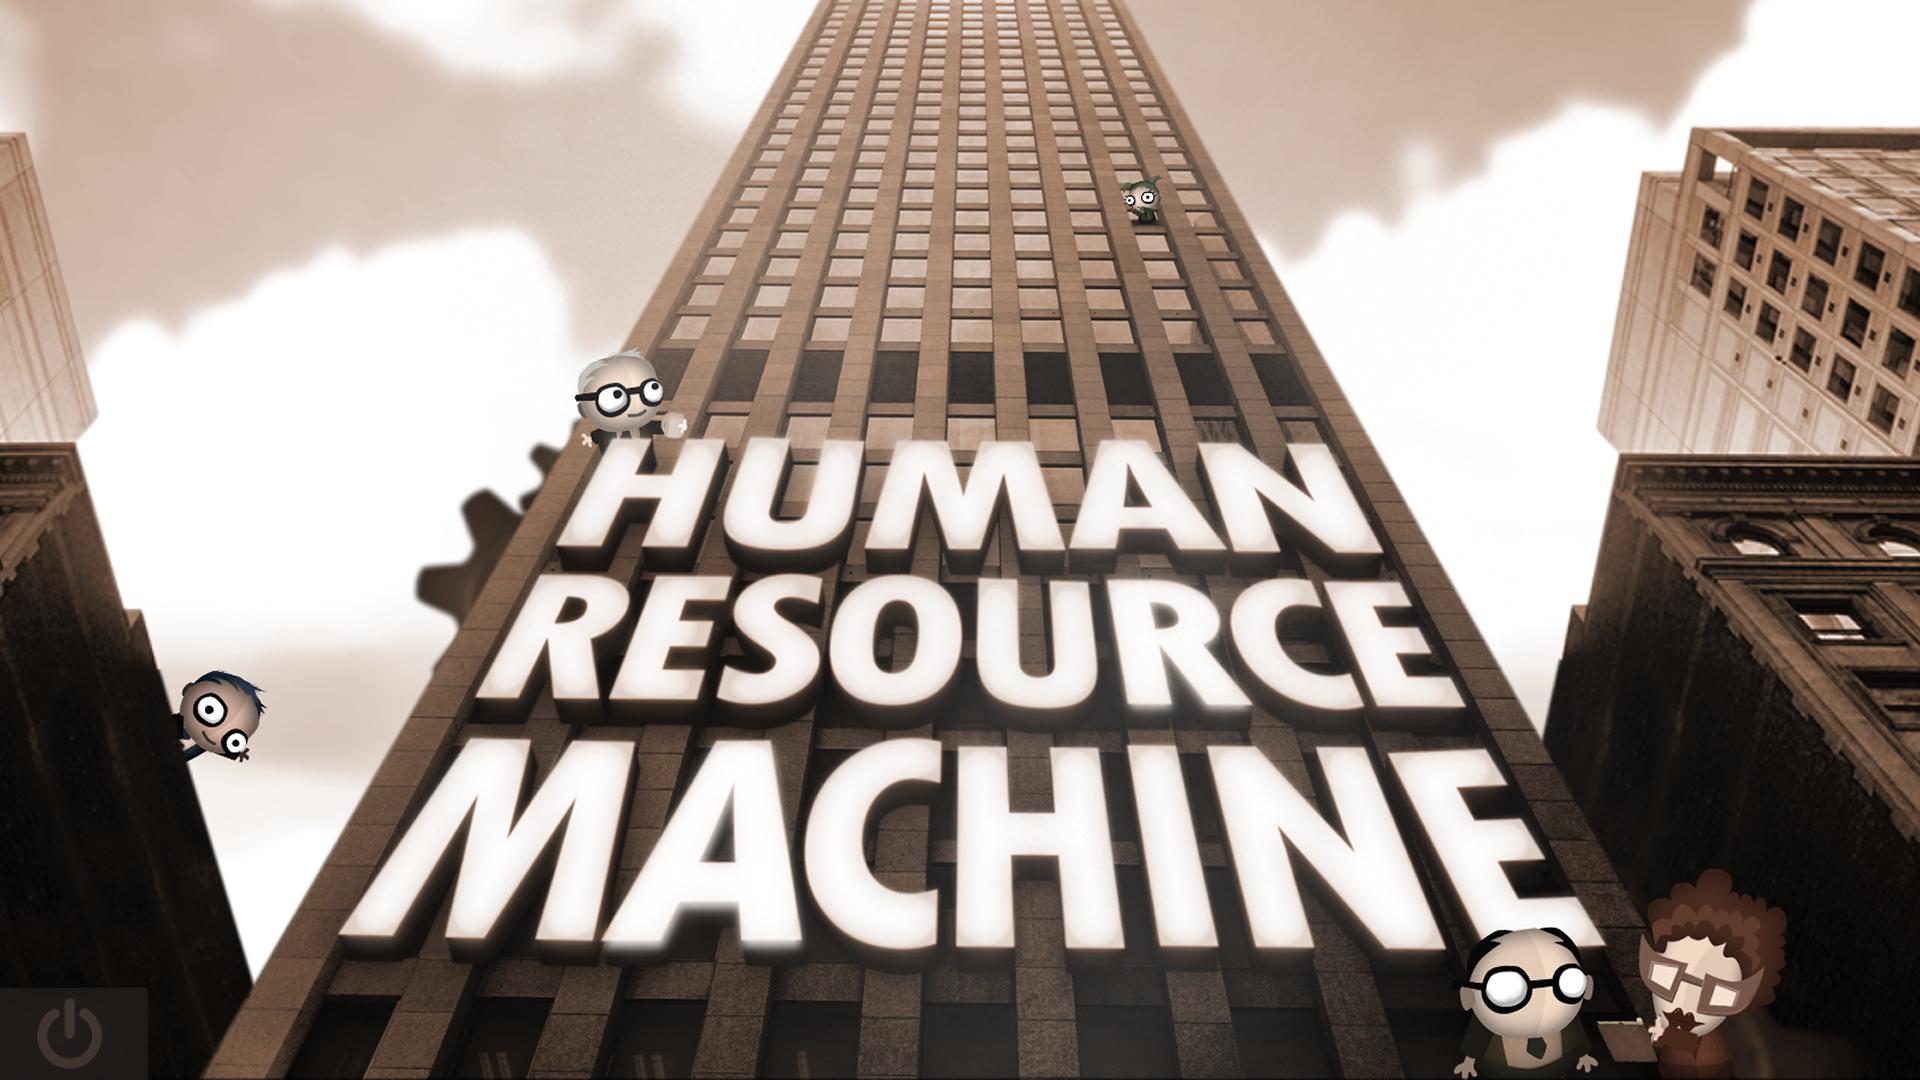 Human-Resource-Machine